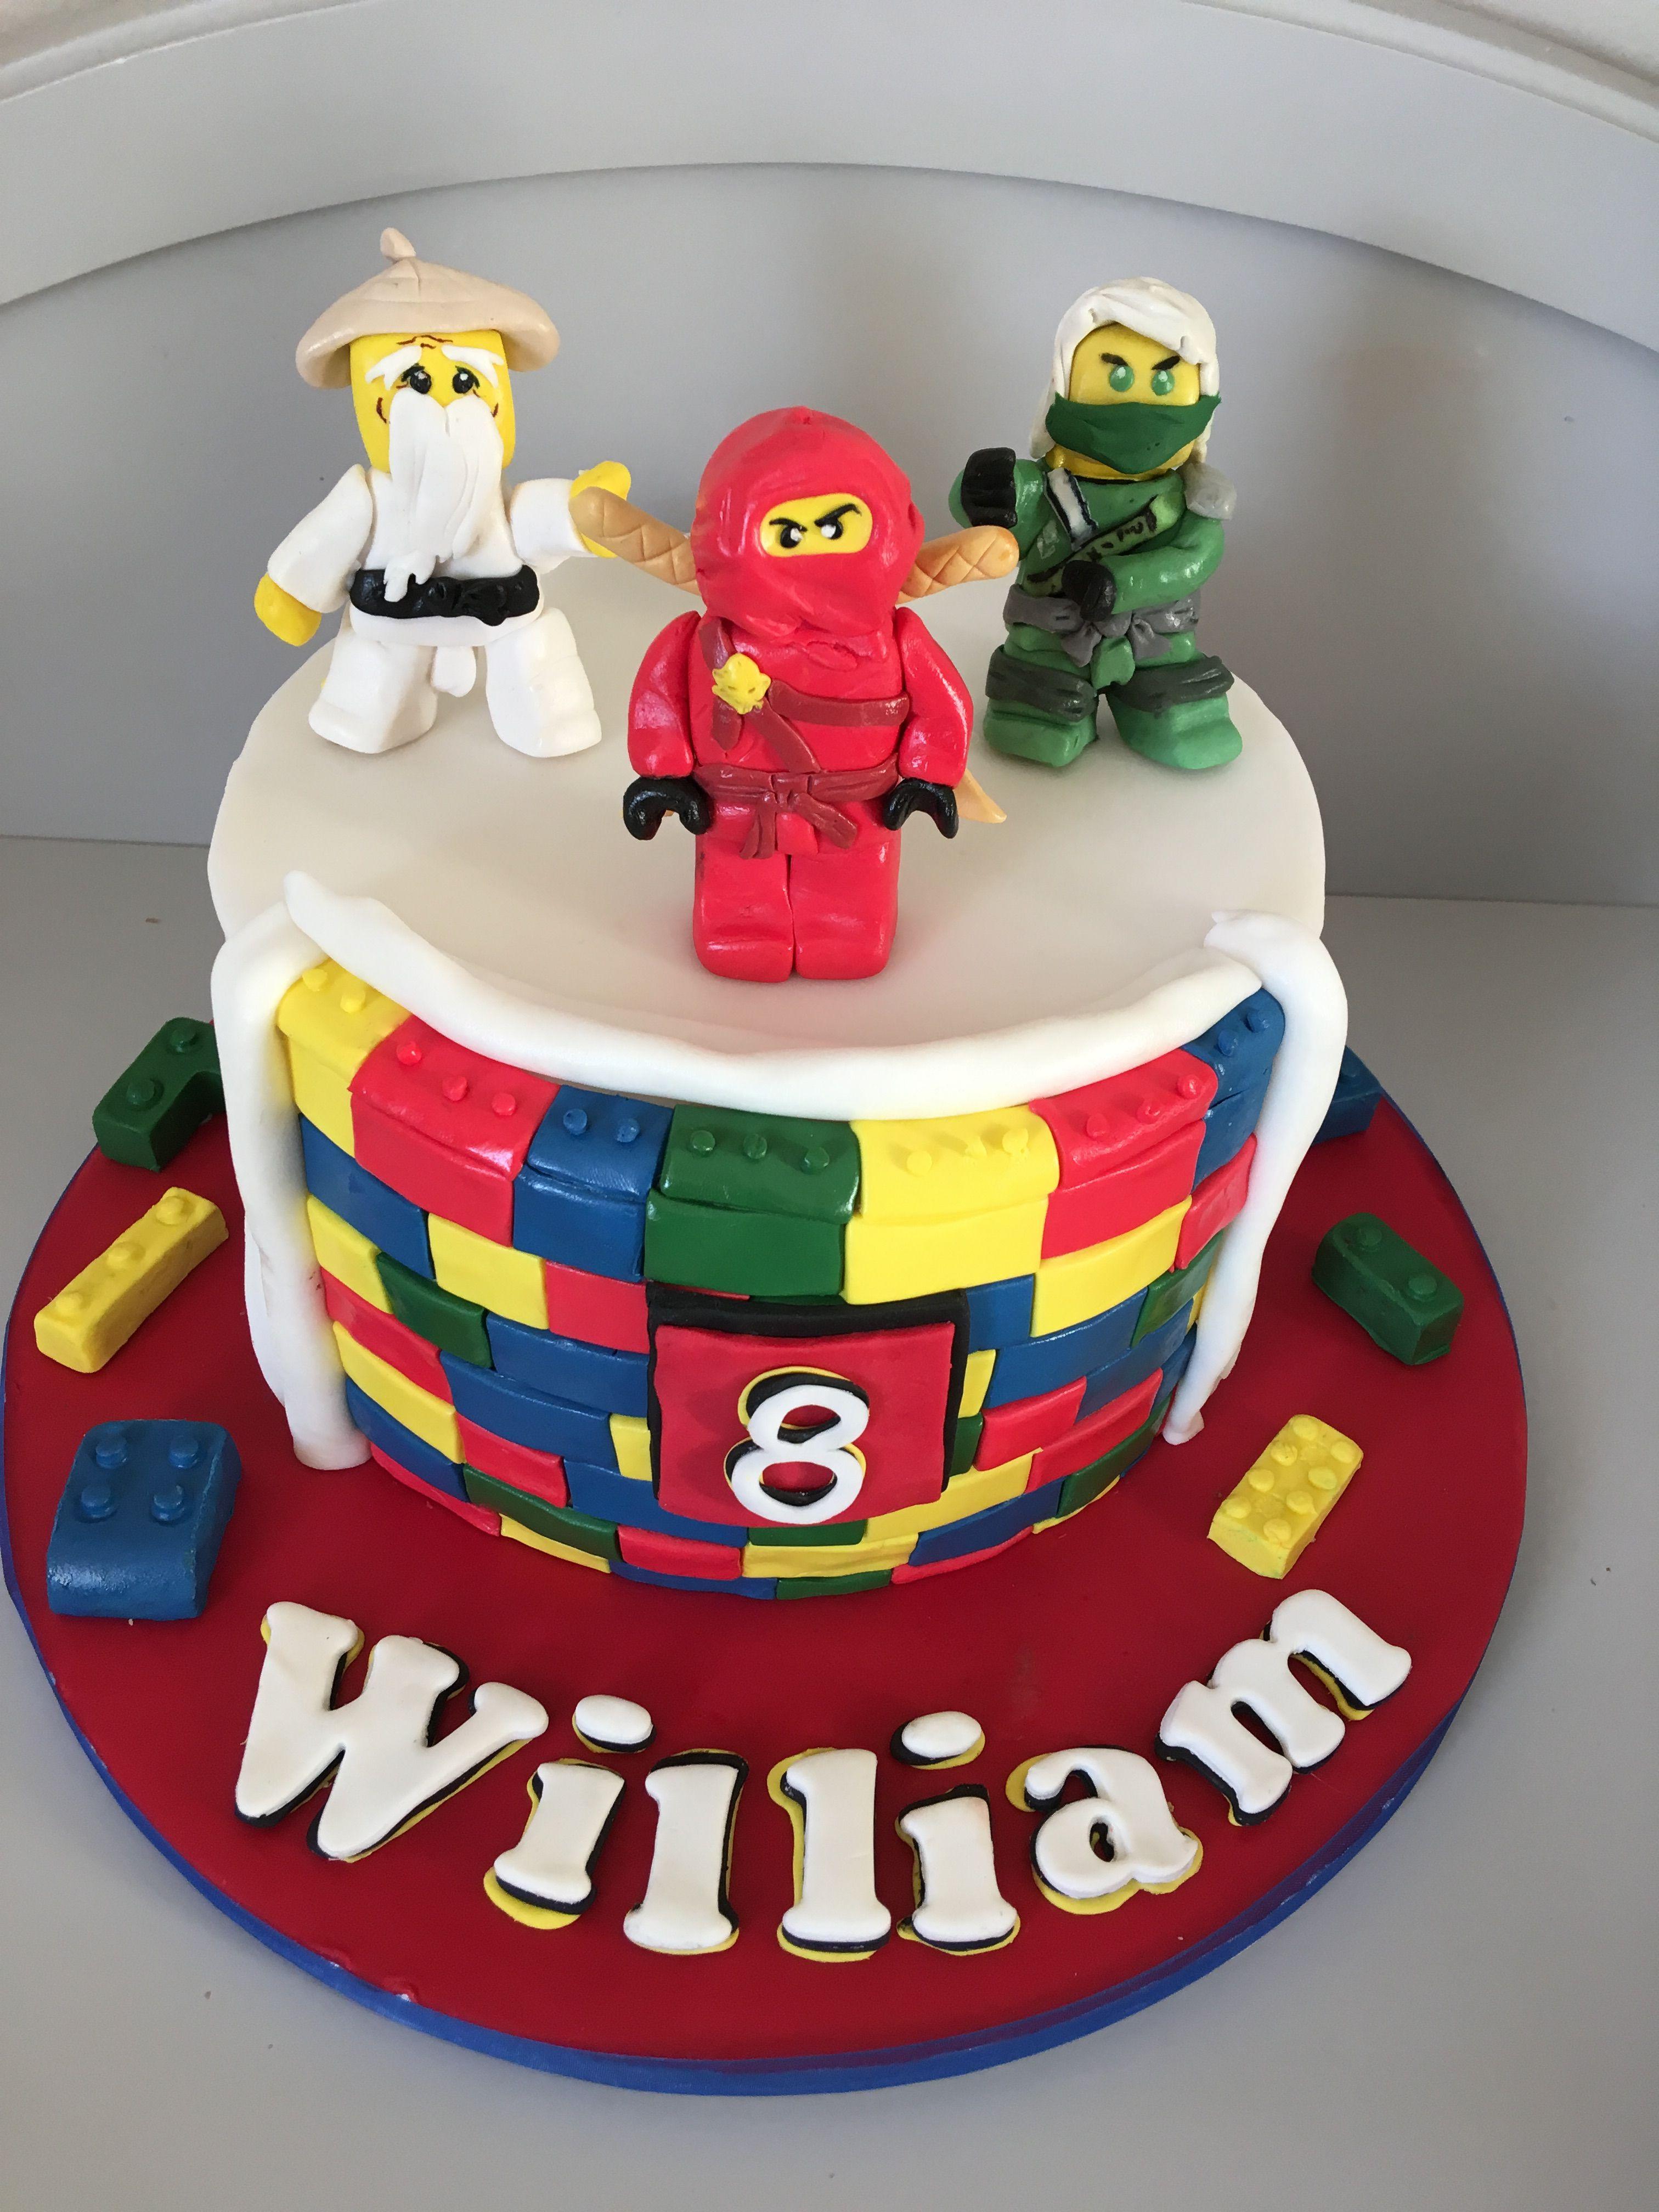 Lego Ninjago Cake Ninjago Cakes Lego Ninjago Cake Cake